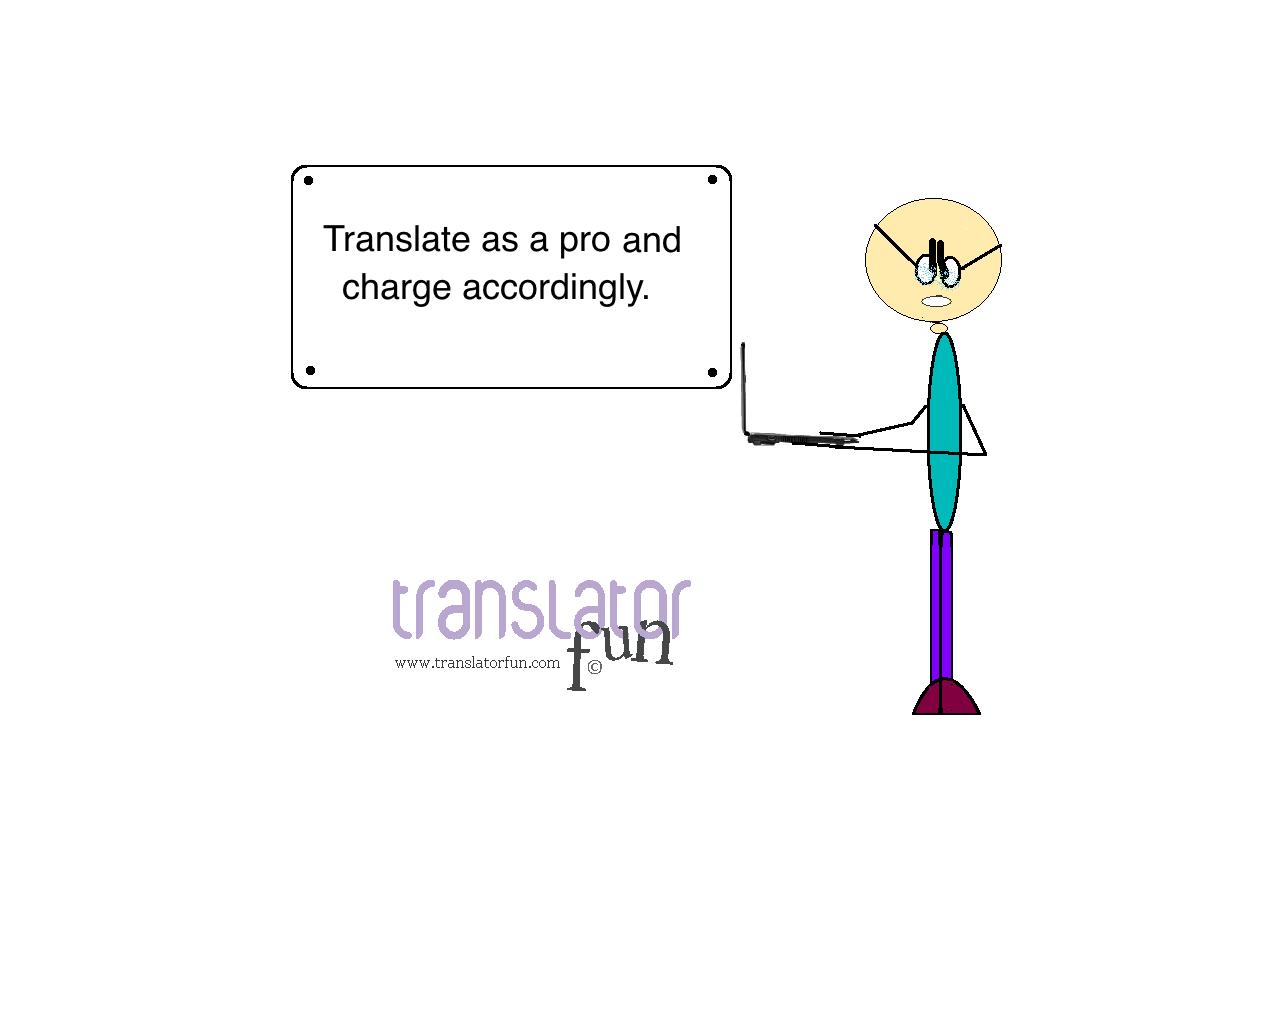 Best practices for translators